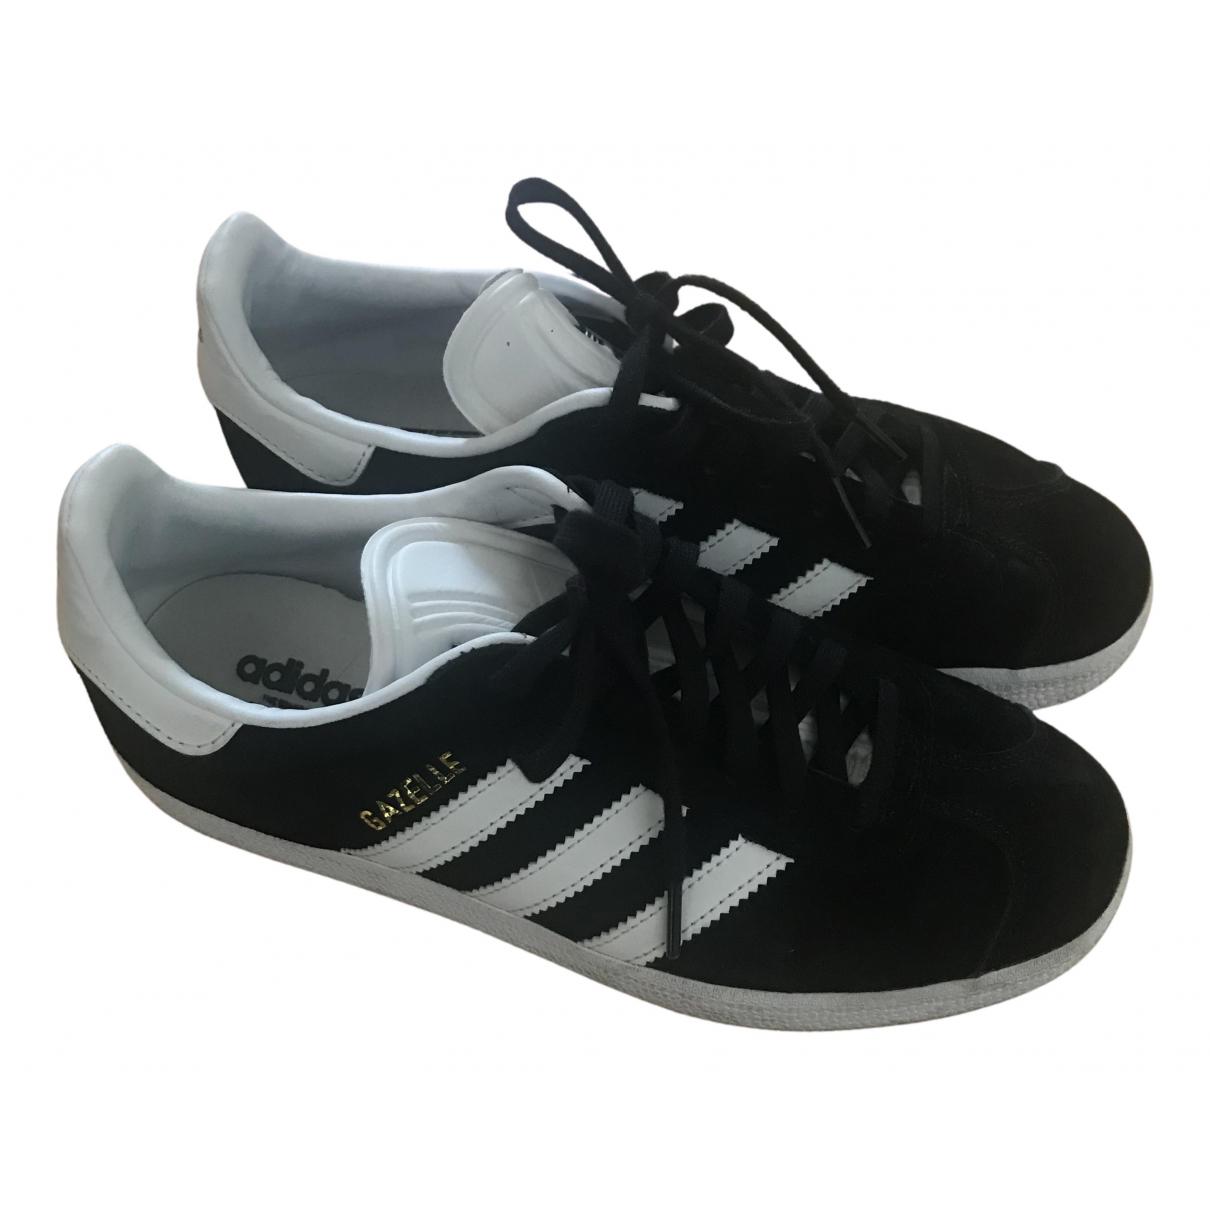 Adidas Gazelle Sneakers in  Schwarz Veloursleder